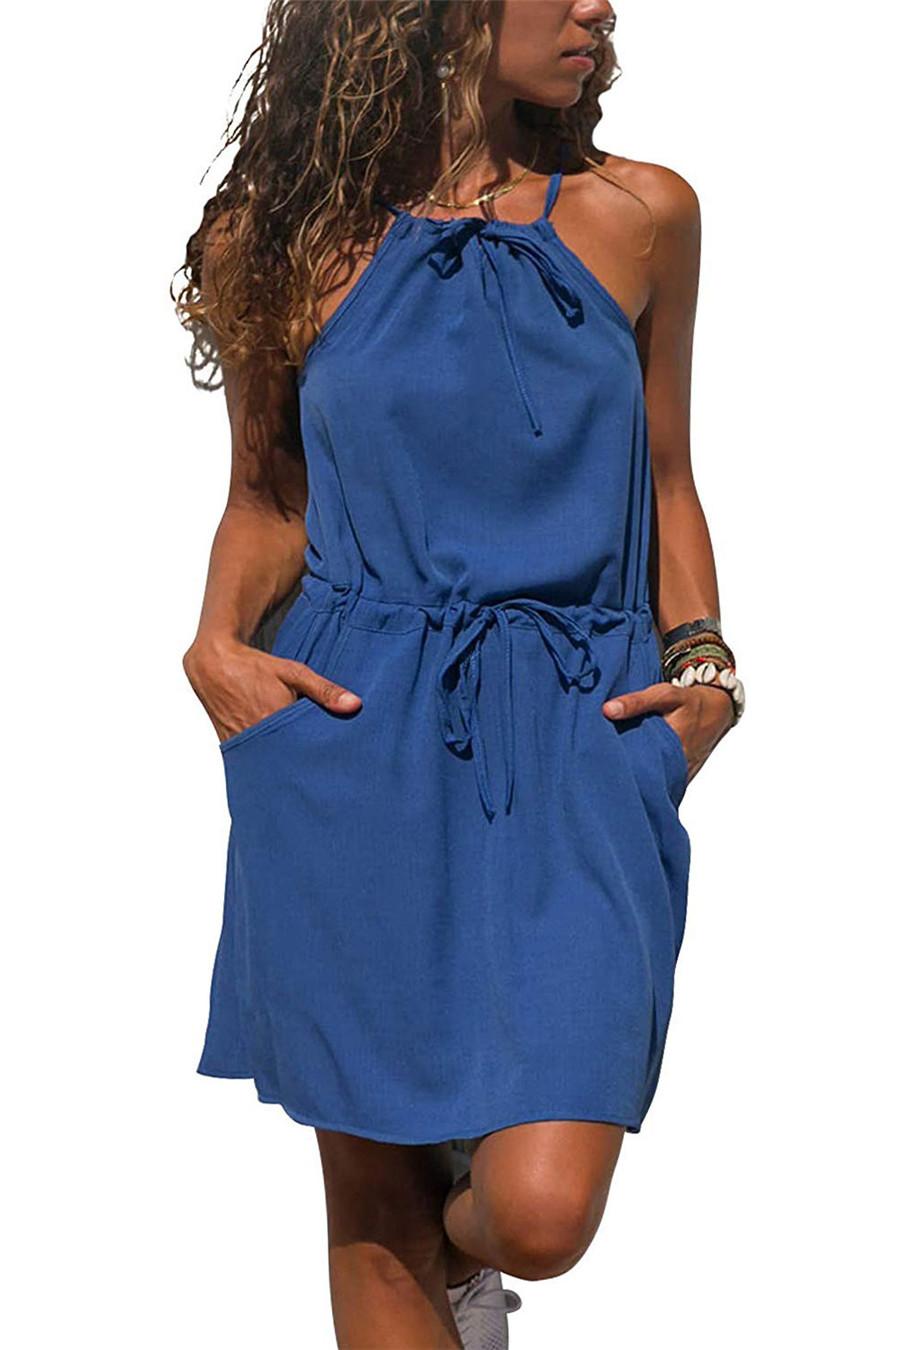 Gladiolus Chiffon Women Summer Dress Spaghetti Strap Floral Print Pocket Sexy Bohemian Beach Dress 2019 Short Ladies Dresses (44)